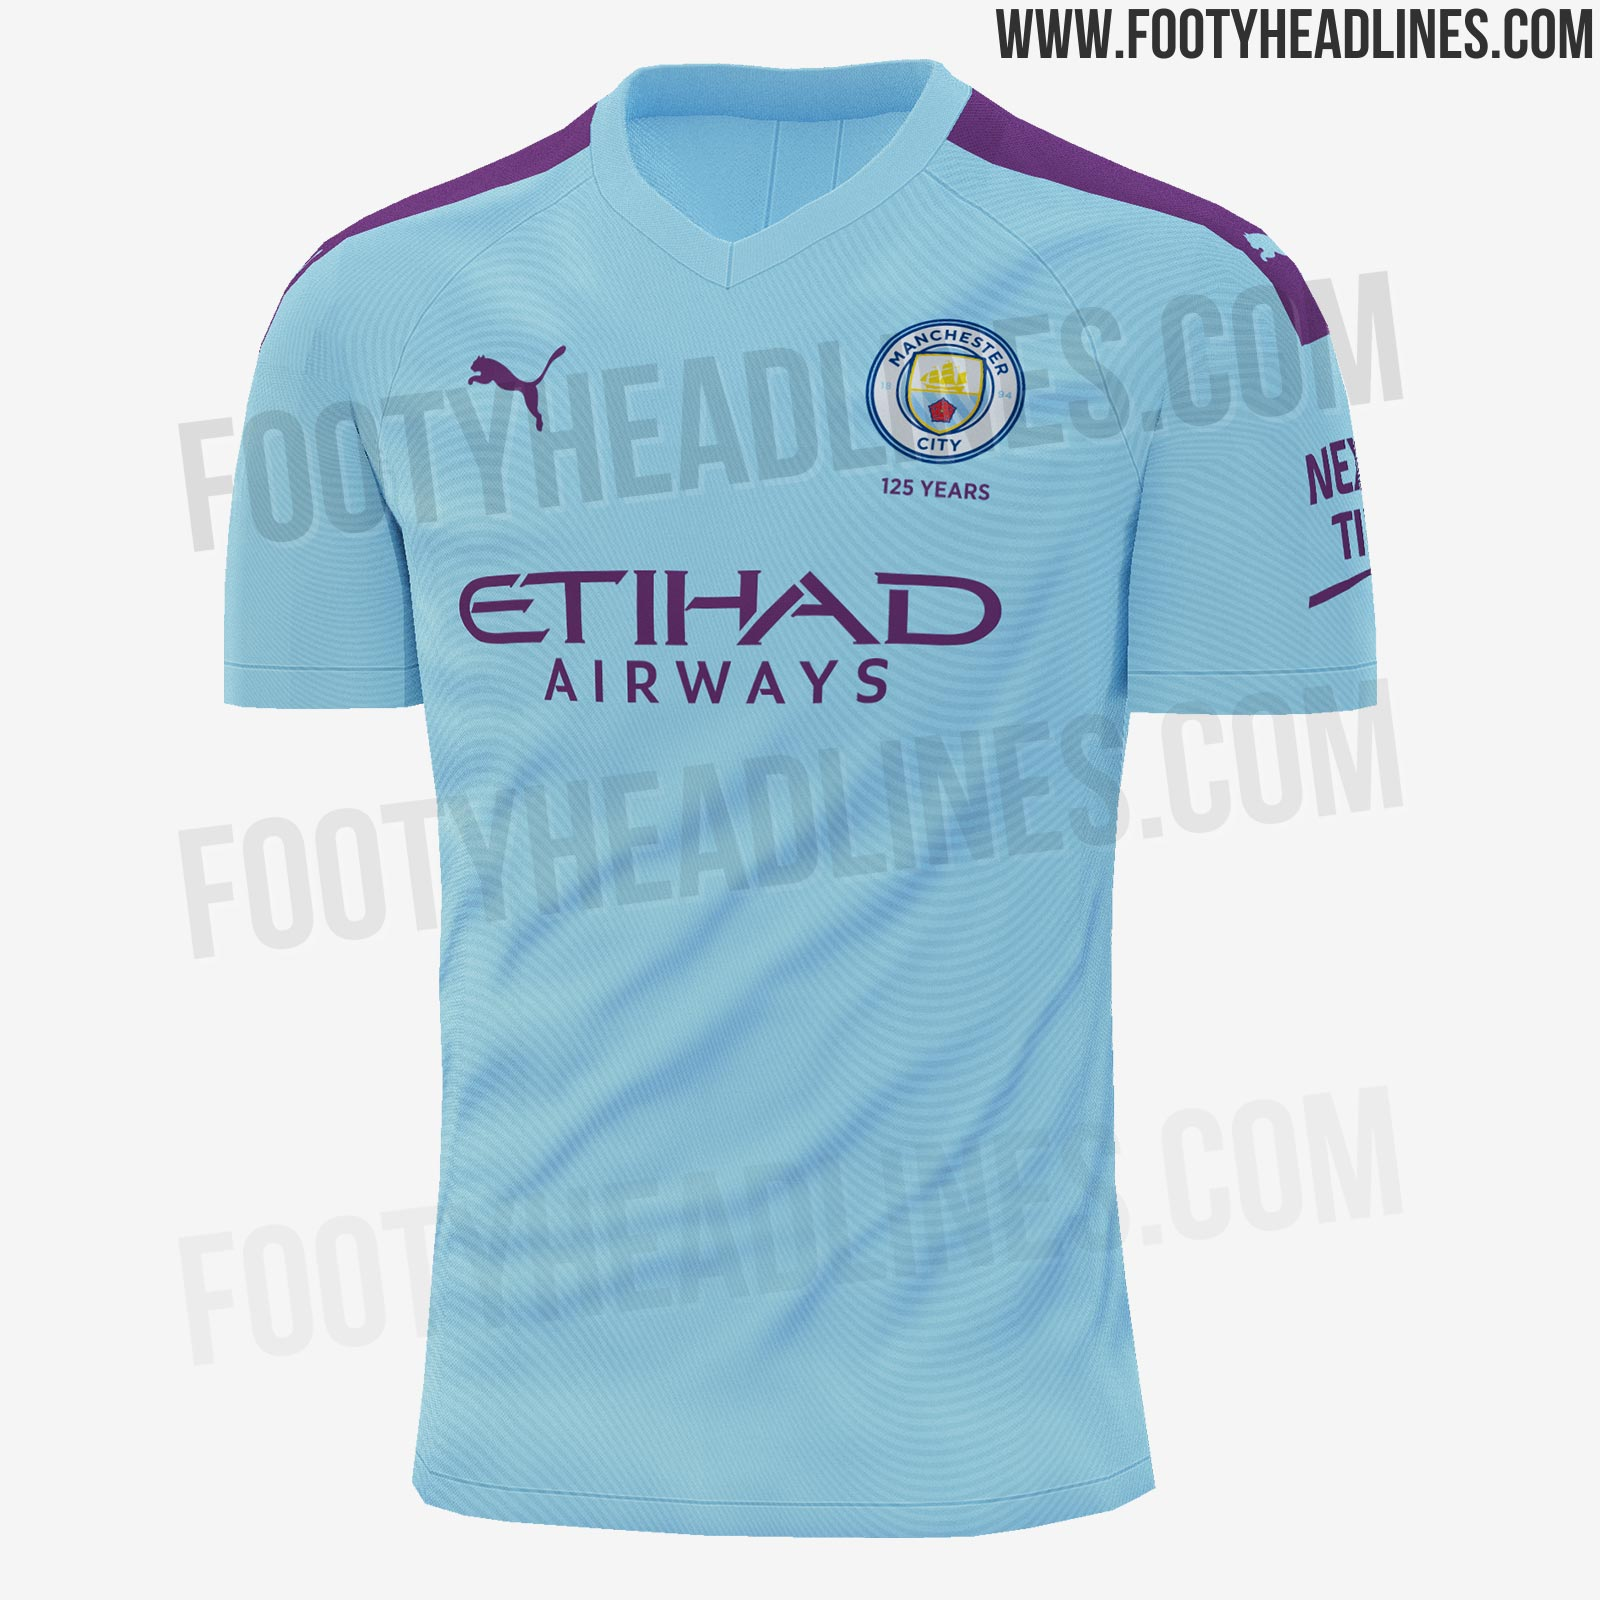 Home Kit Leak Confirmed - Puma Manchester City 19-20